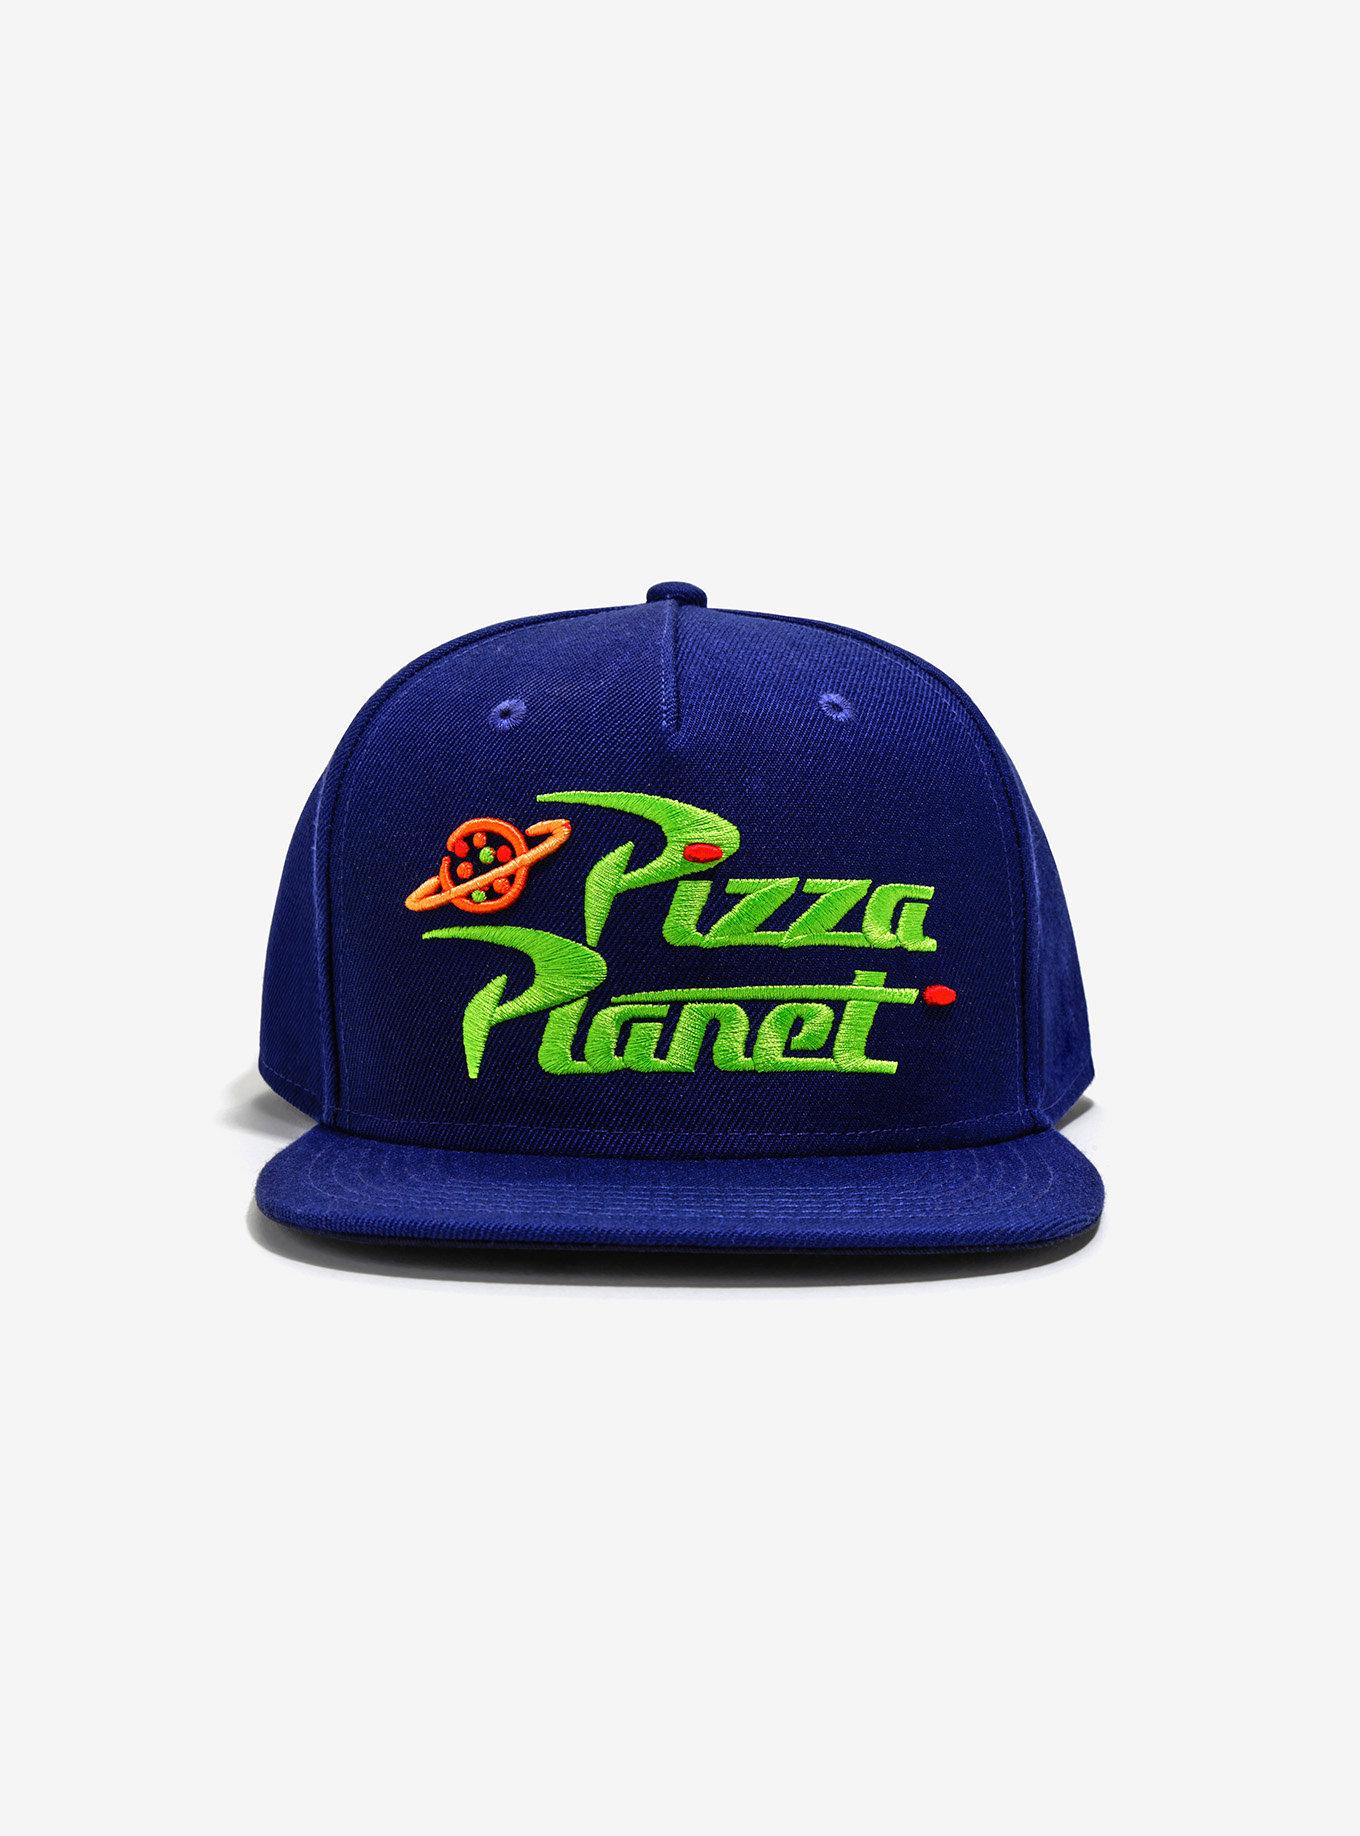 pizza planet hat.jpg